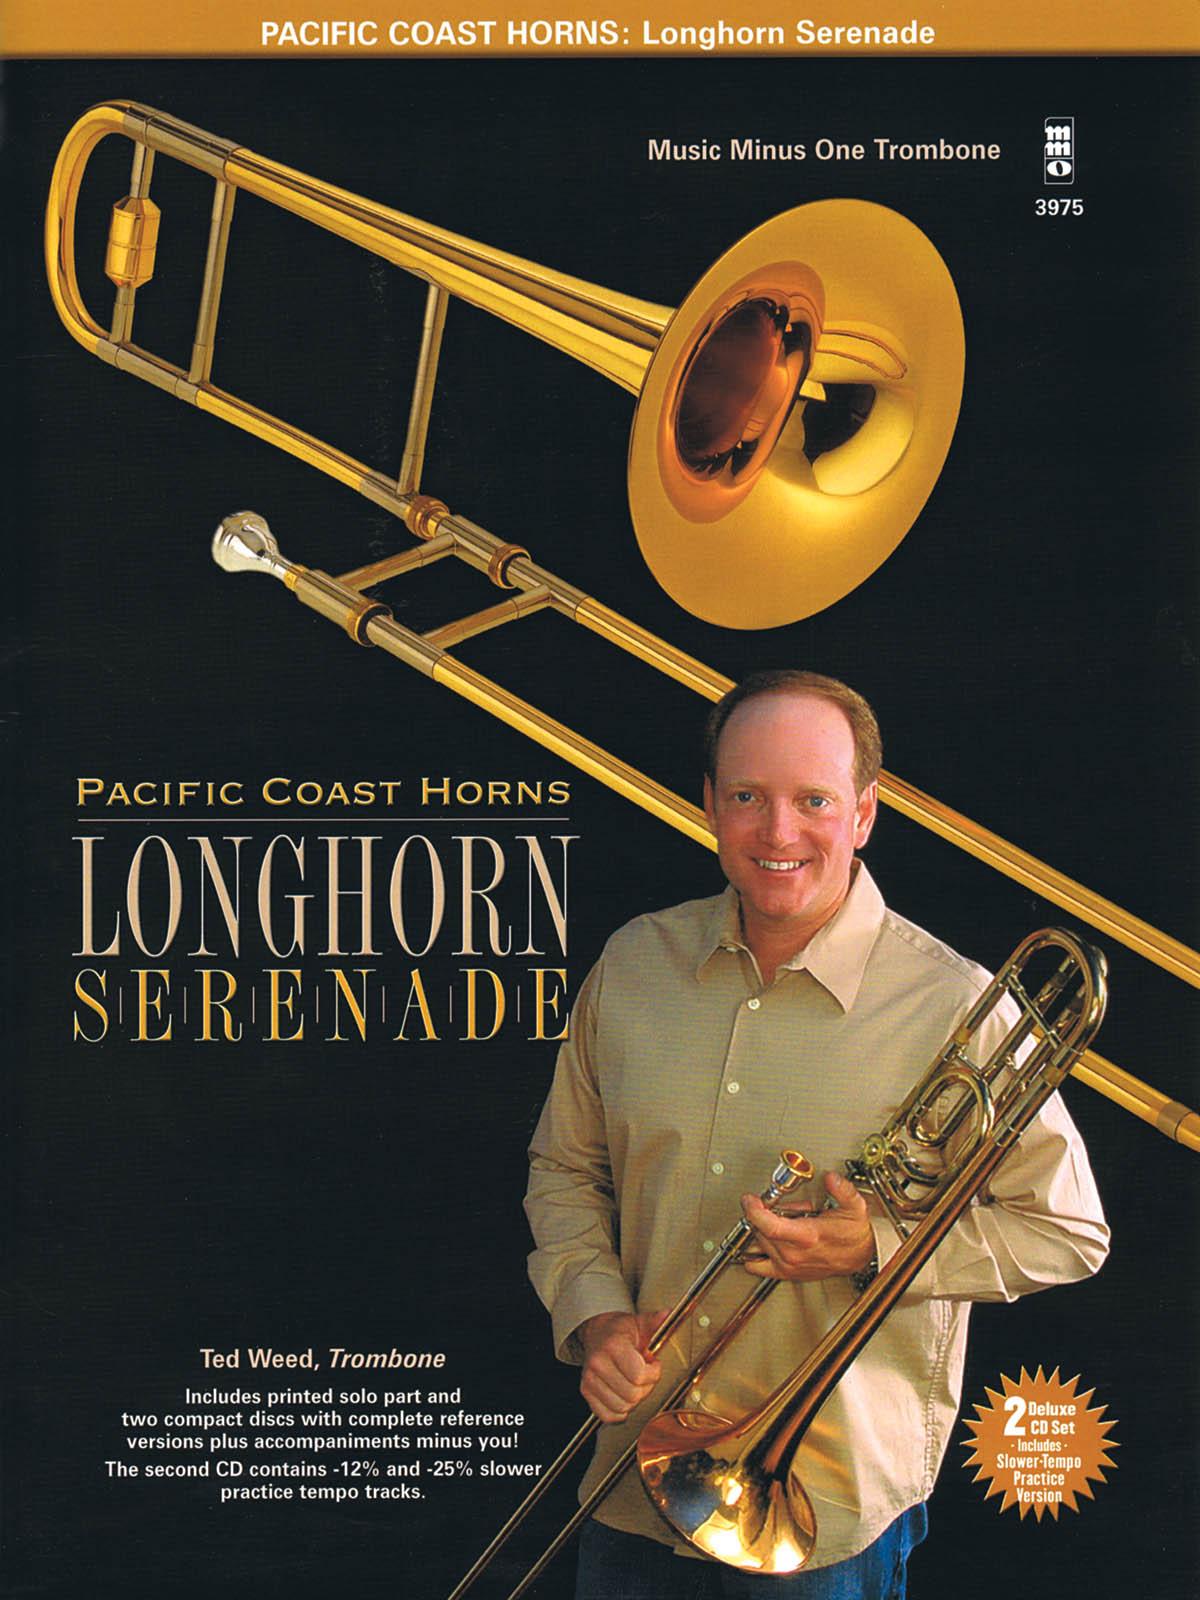 Pacific Coast Horns: Pacific Coast Horns  Volume 1 - Longhorn Serenade: Trombone